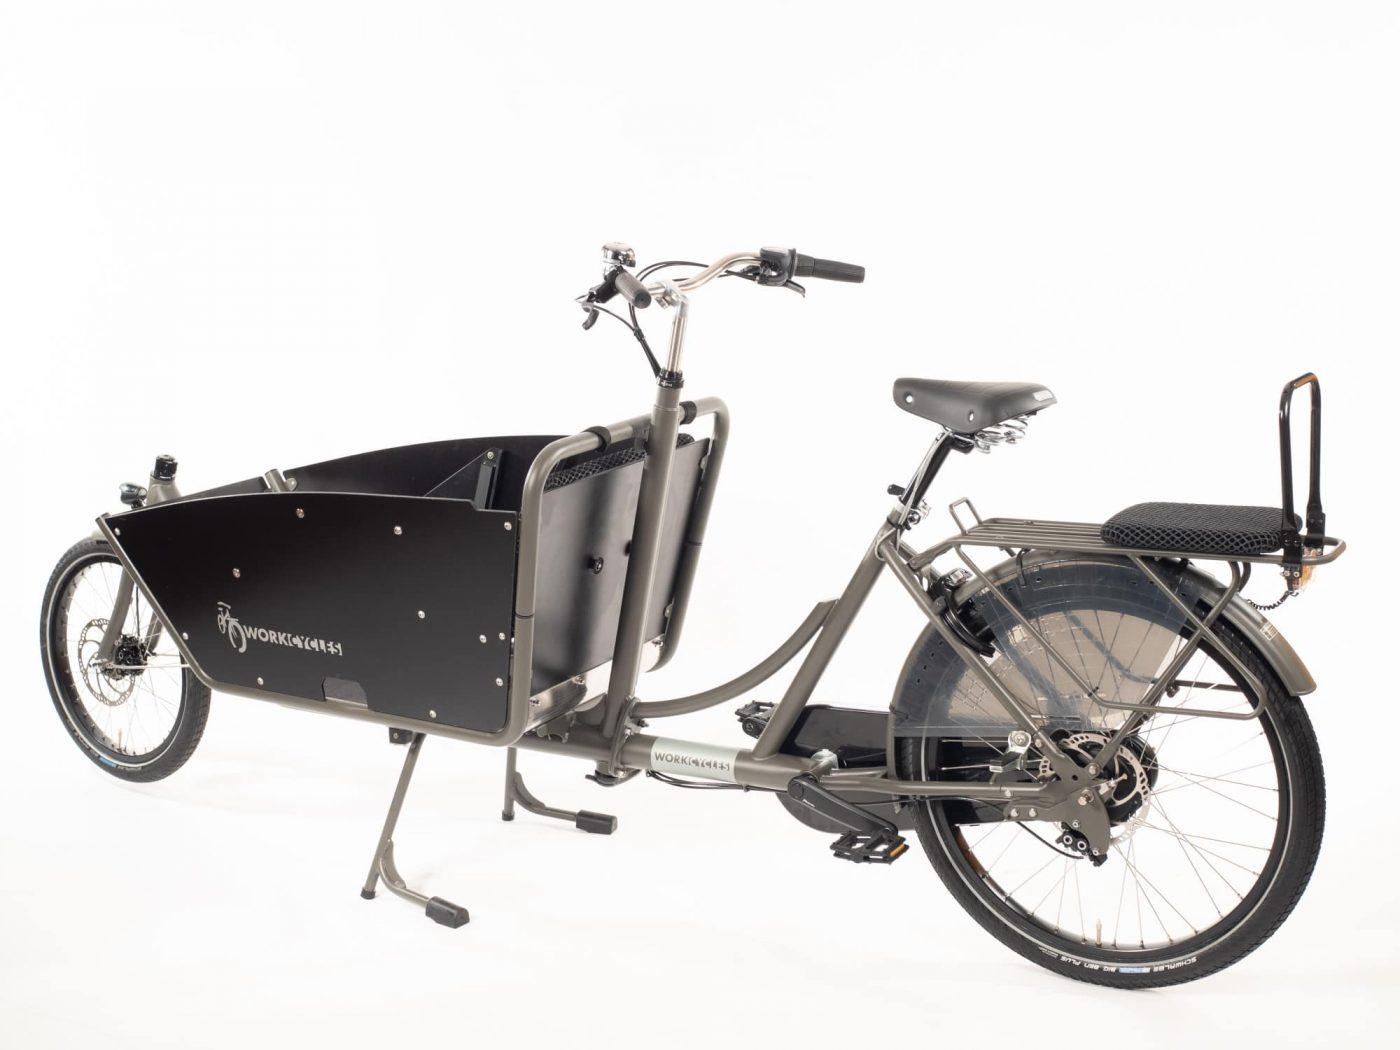 WorkCycles Kr8 bakfiets, child transport bike, dutch city bike, Fr8 Single Seat, Large cargo box with kiddy bench